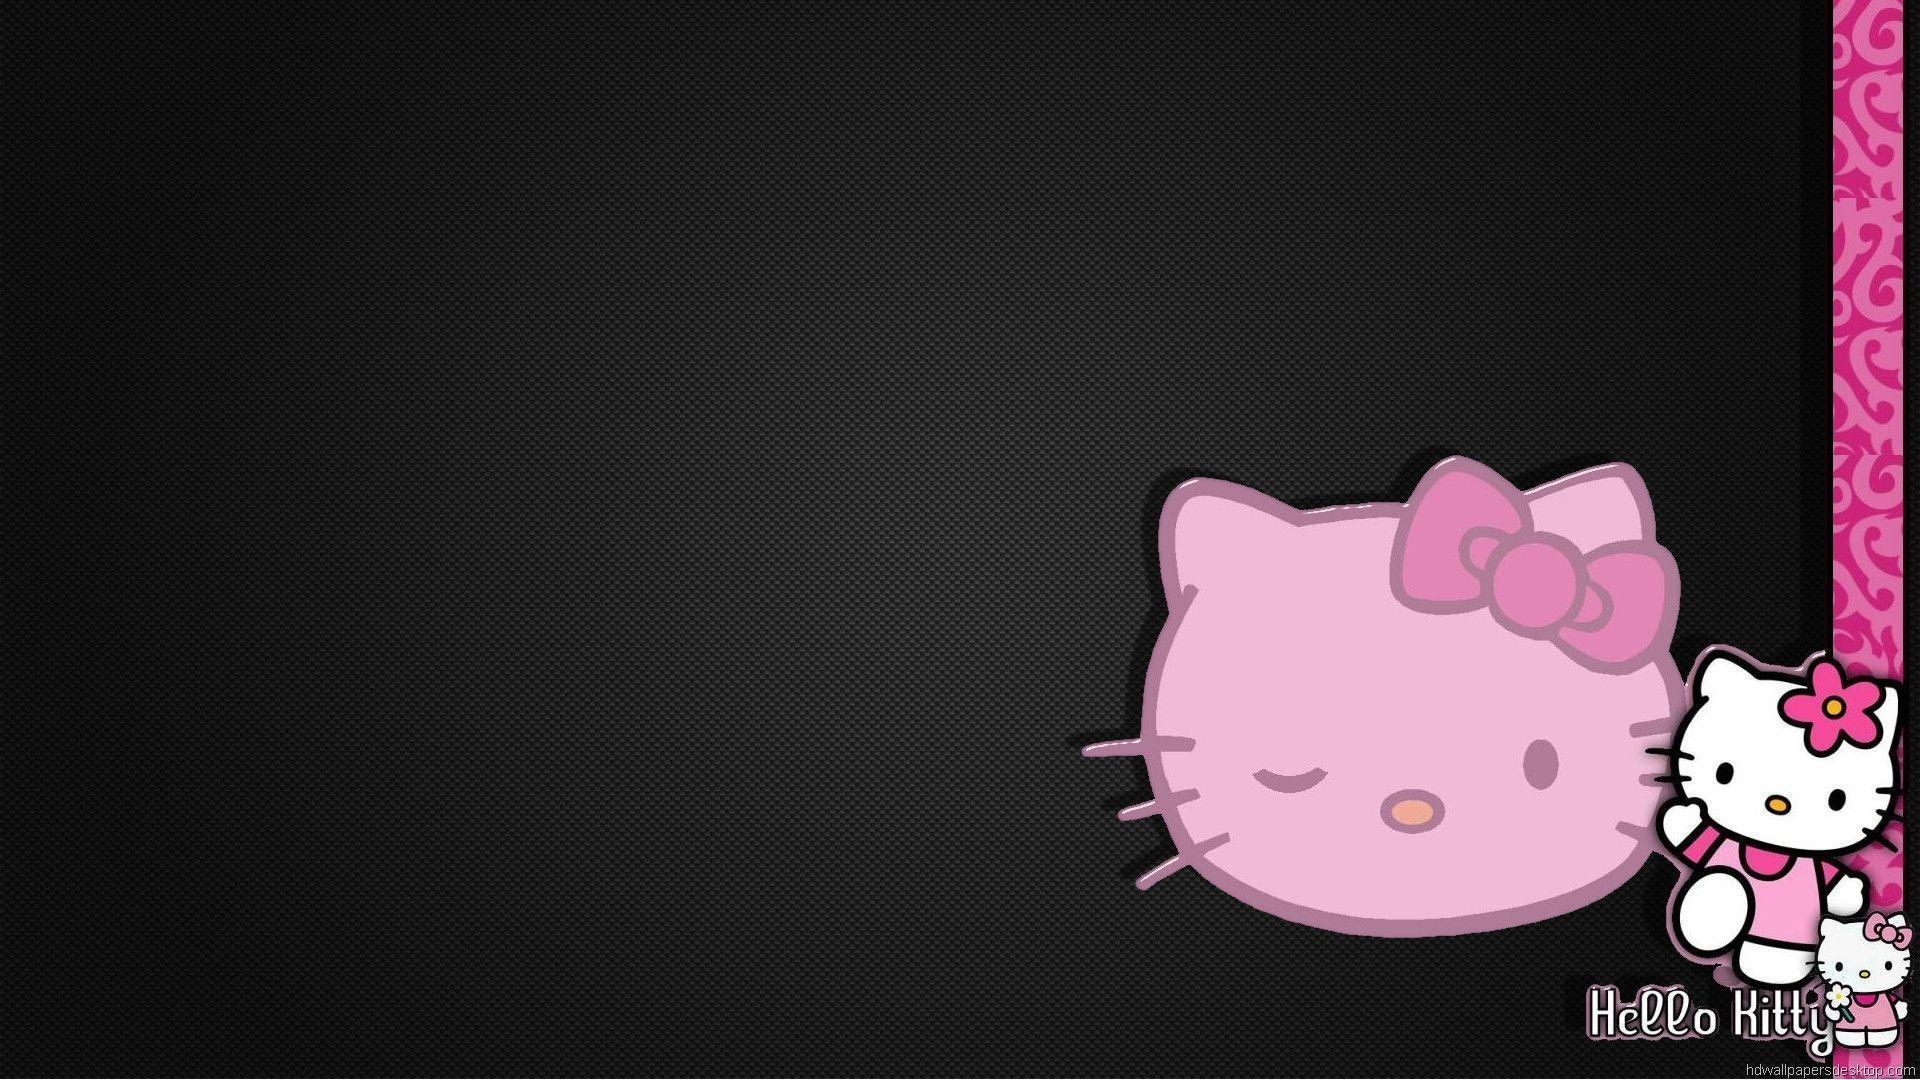 Pink and black hello kitty happy birthday wallpaper free